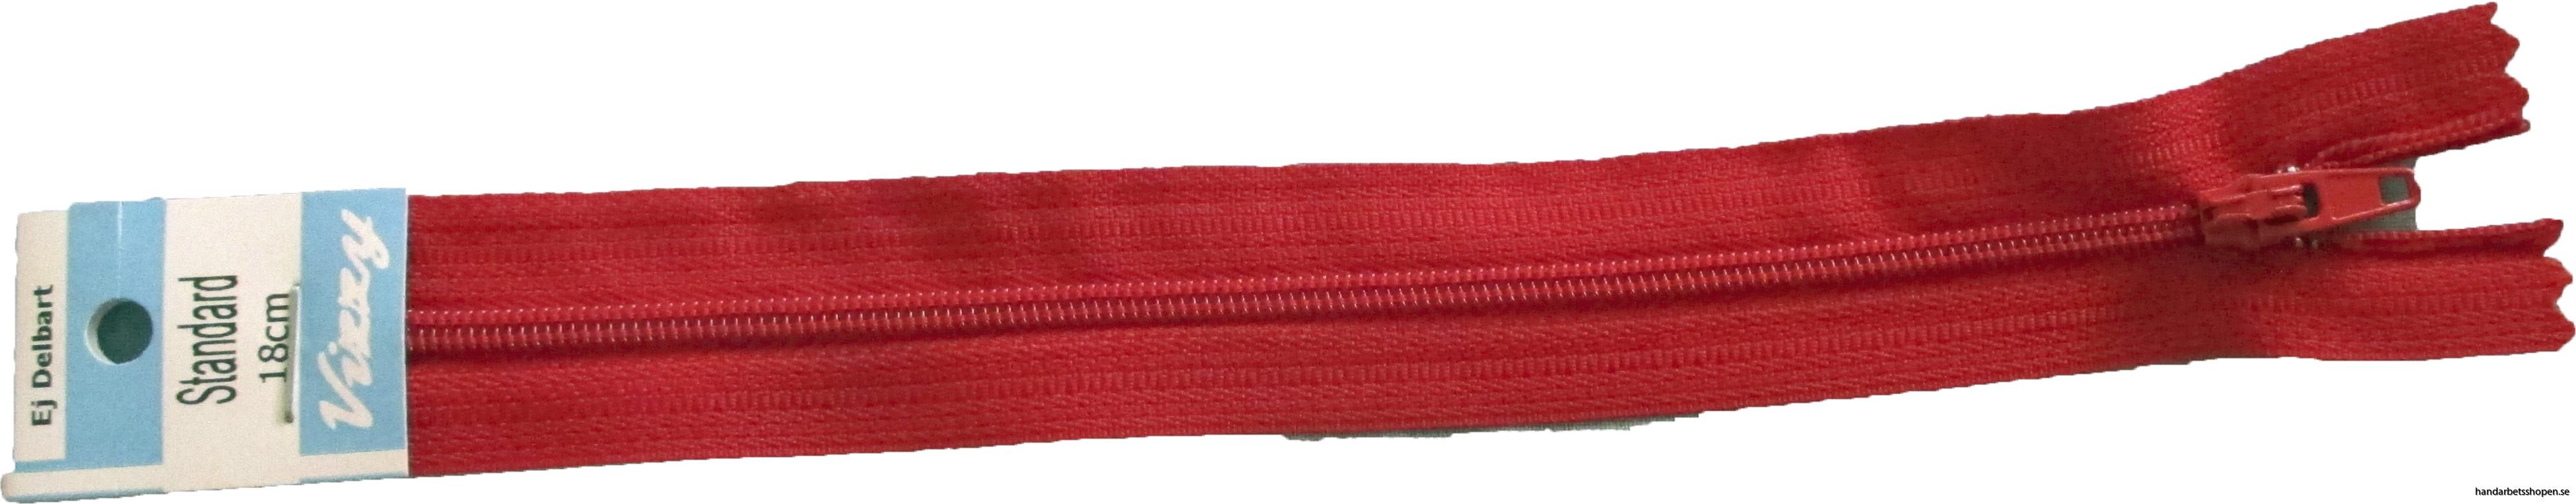 Blixtlås 18 mm Röd